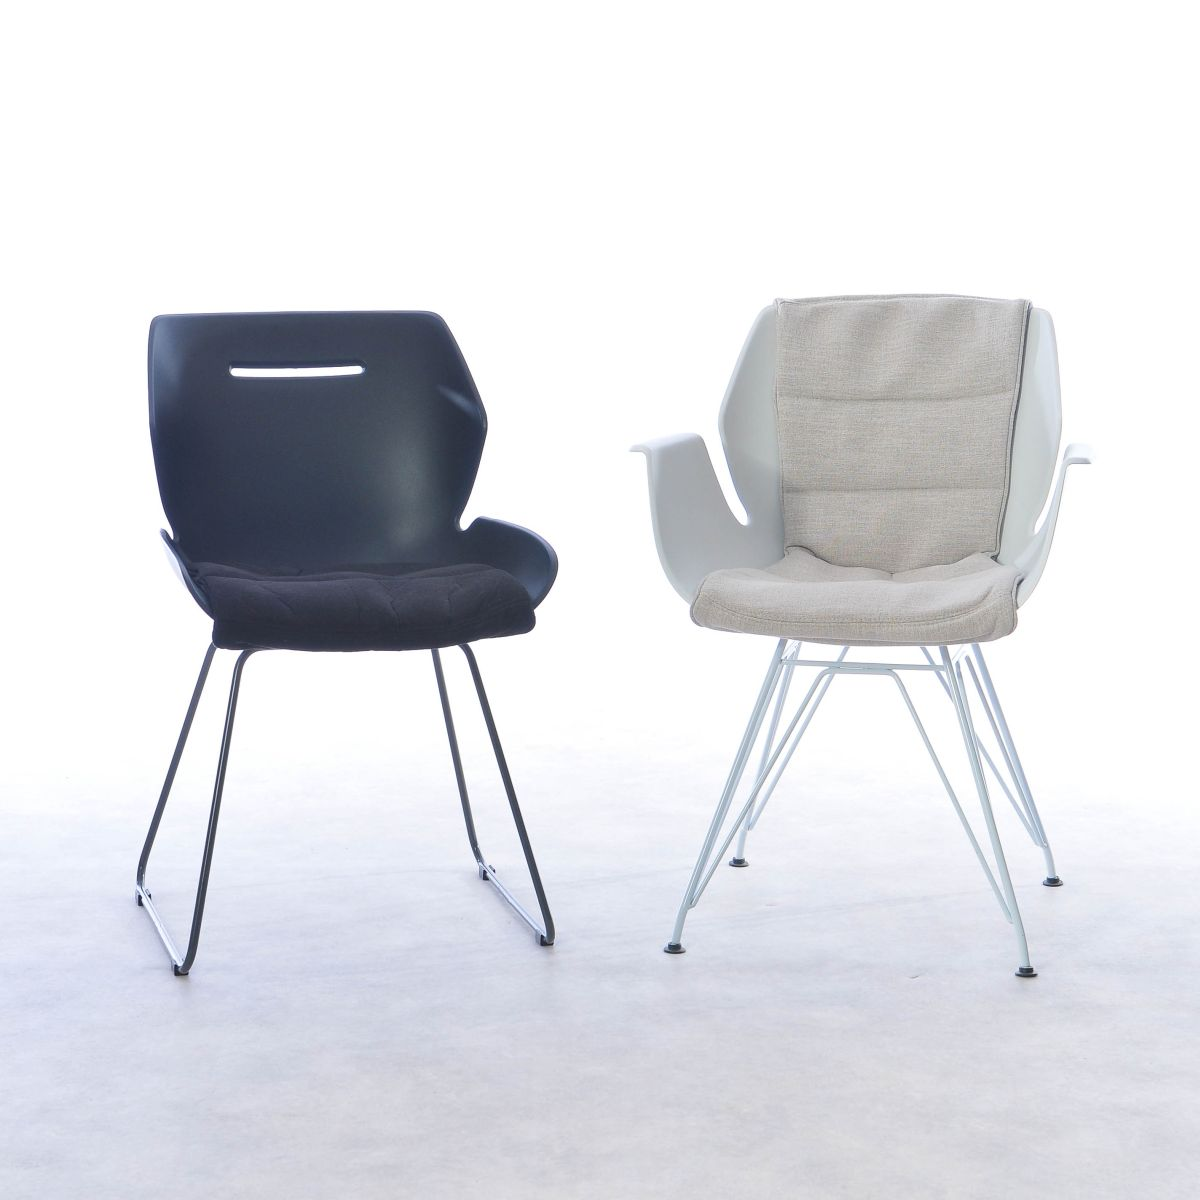 Dining room chair Tooon Iron